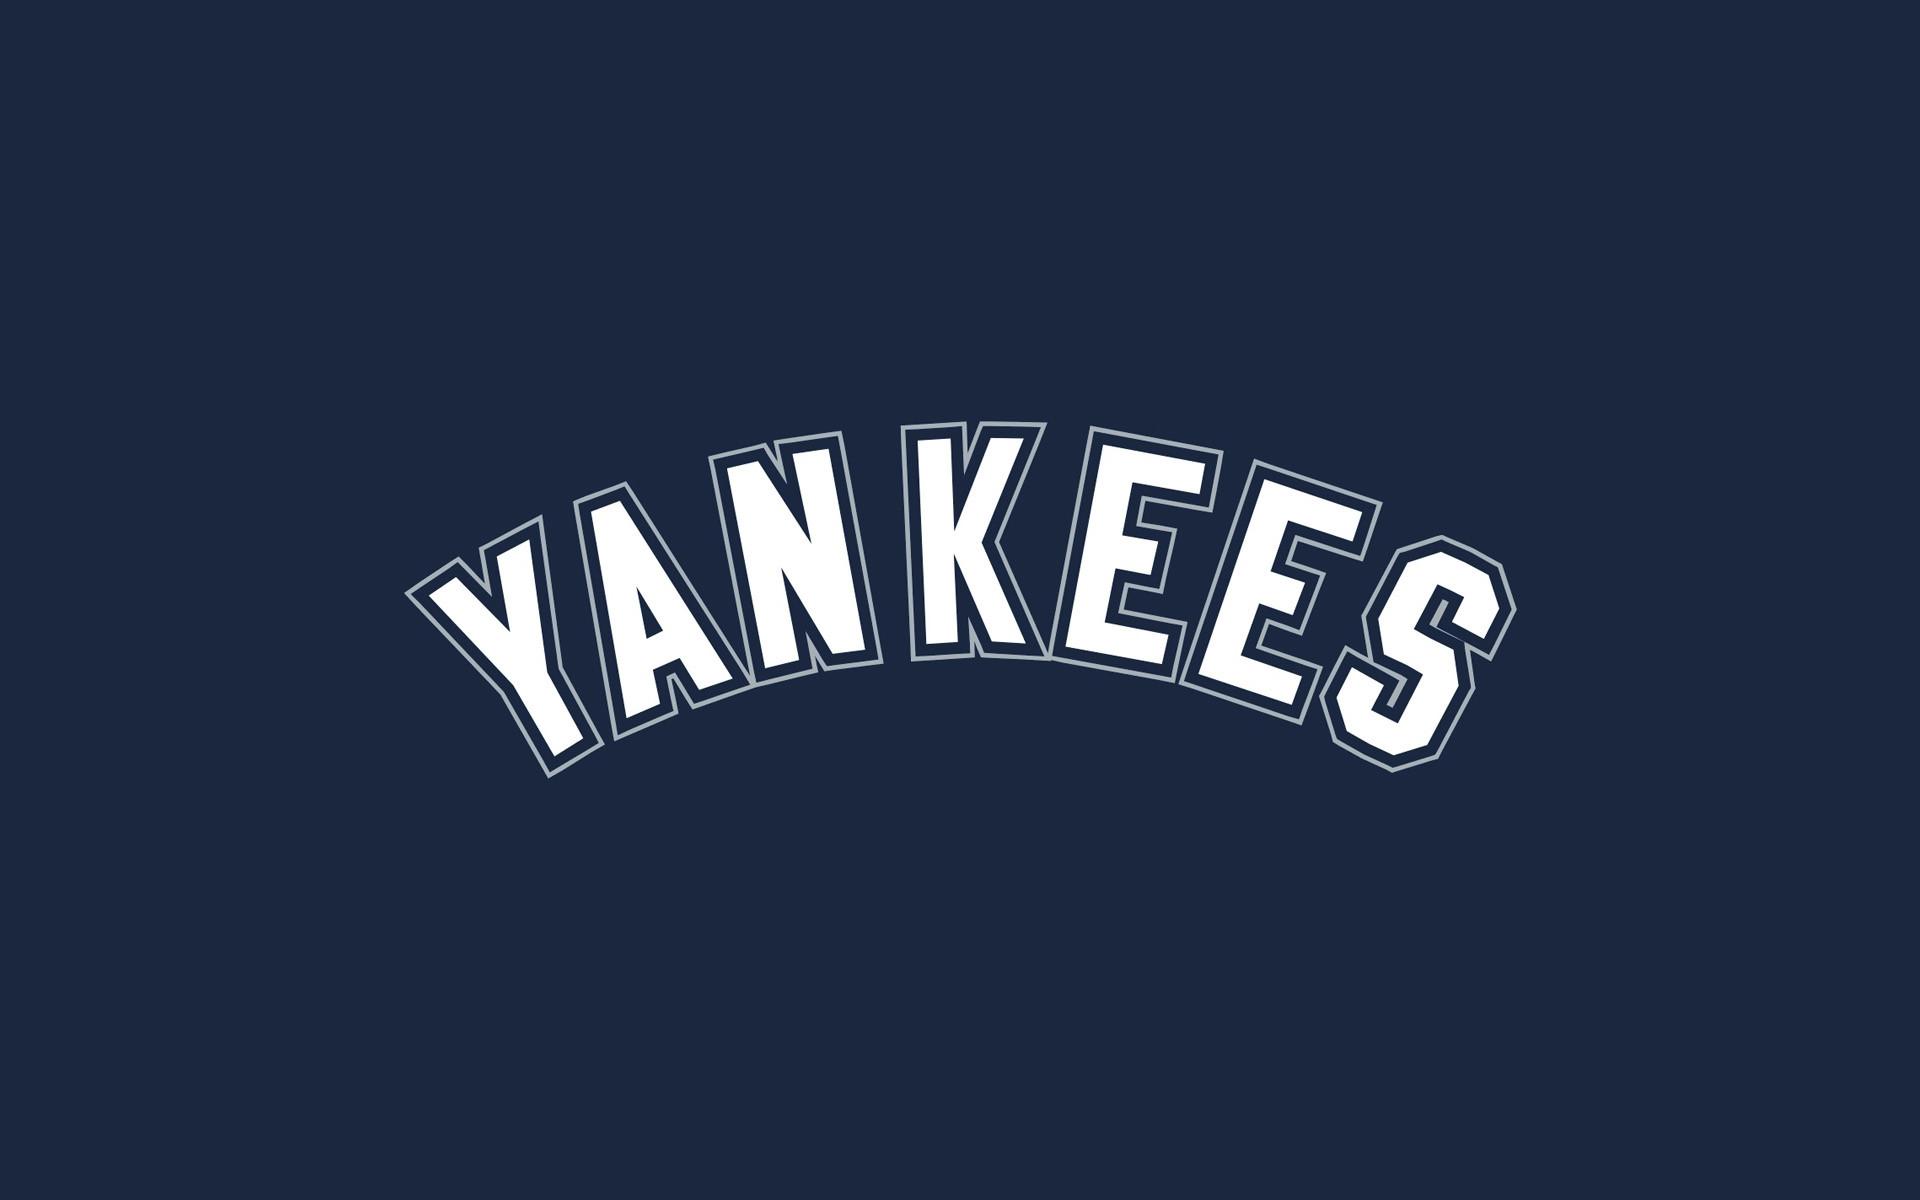 New York Yankees Logo Android Wallpaper HD Future Pinterest   HD Wallpapers    Pinterest   Hd wallpaper and Wallpaper